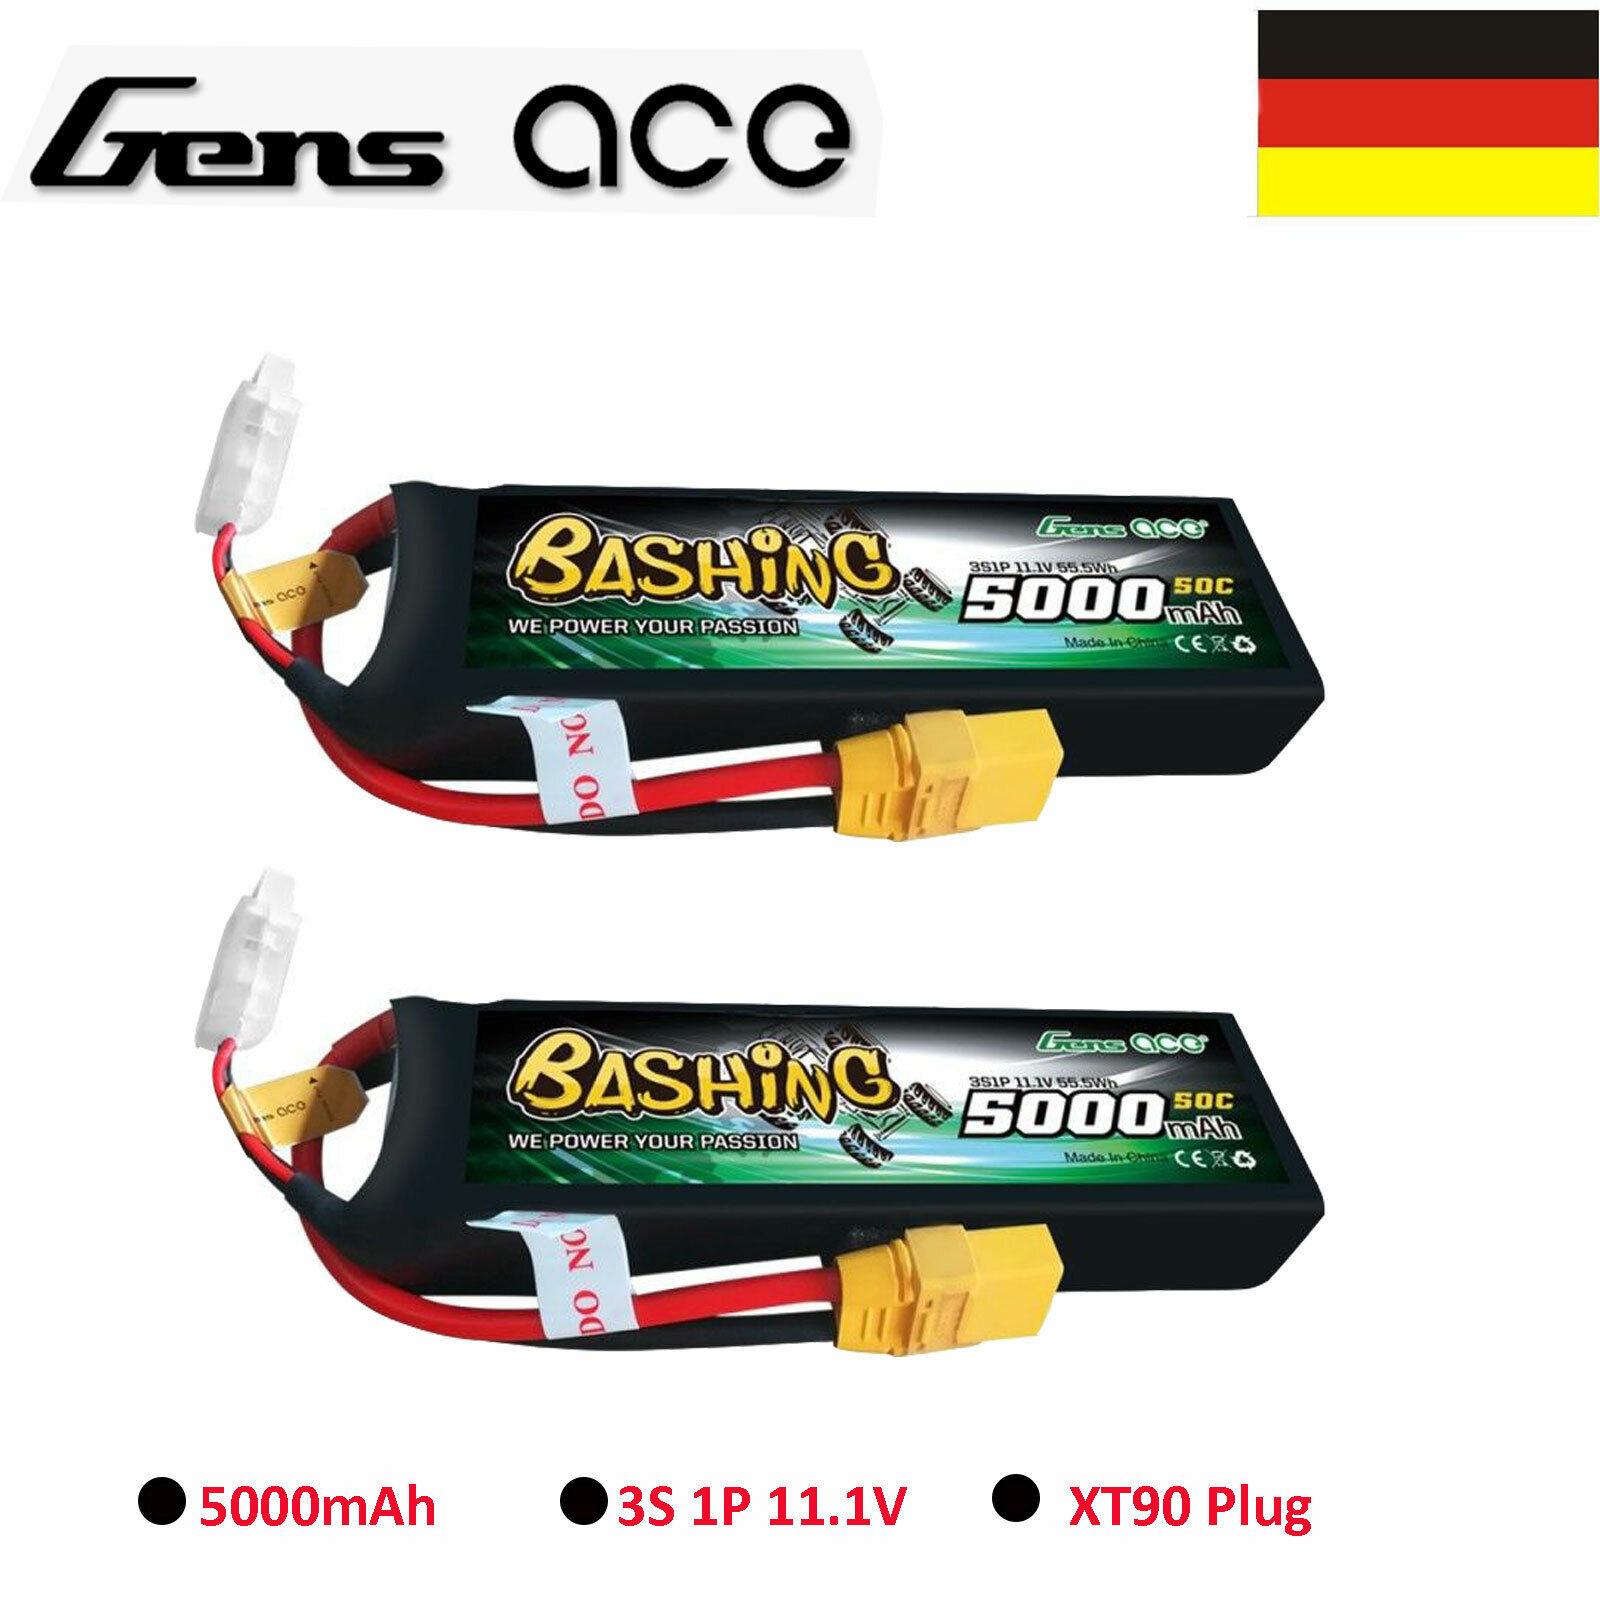 2X 5000mAh 11.1V 50C 3S Lipo Batteria XT90 Spina Per 1 8 1 10 Camion Auto Arrma